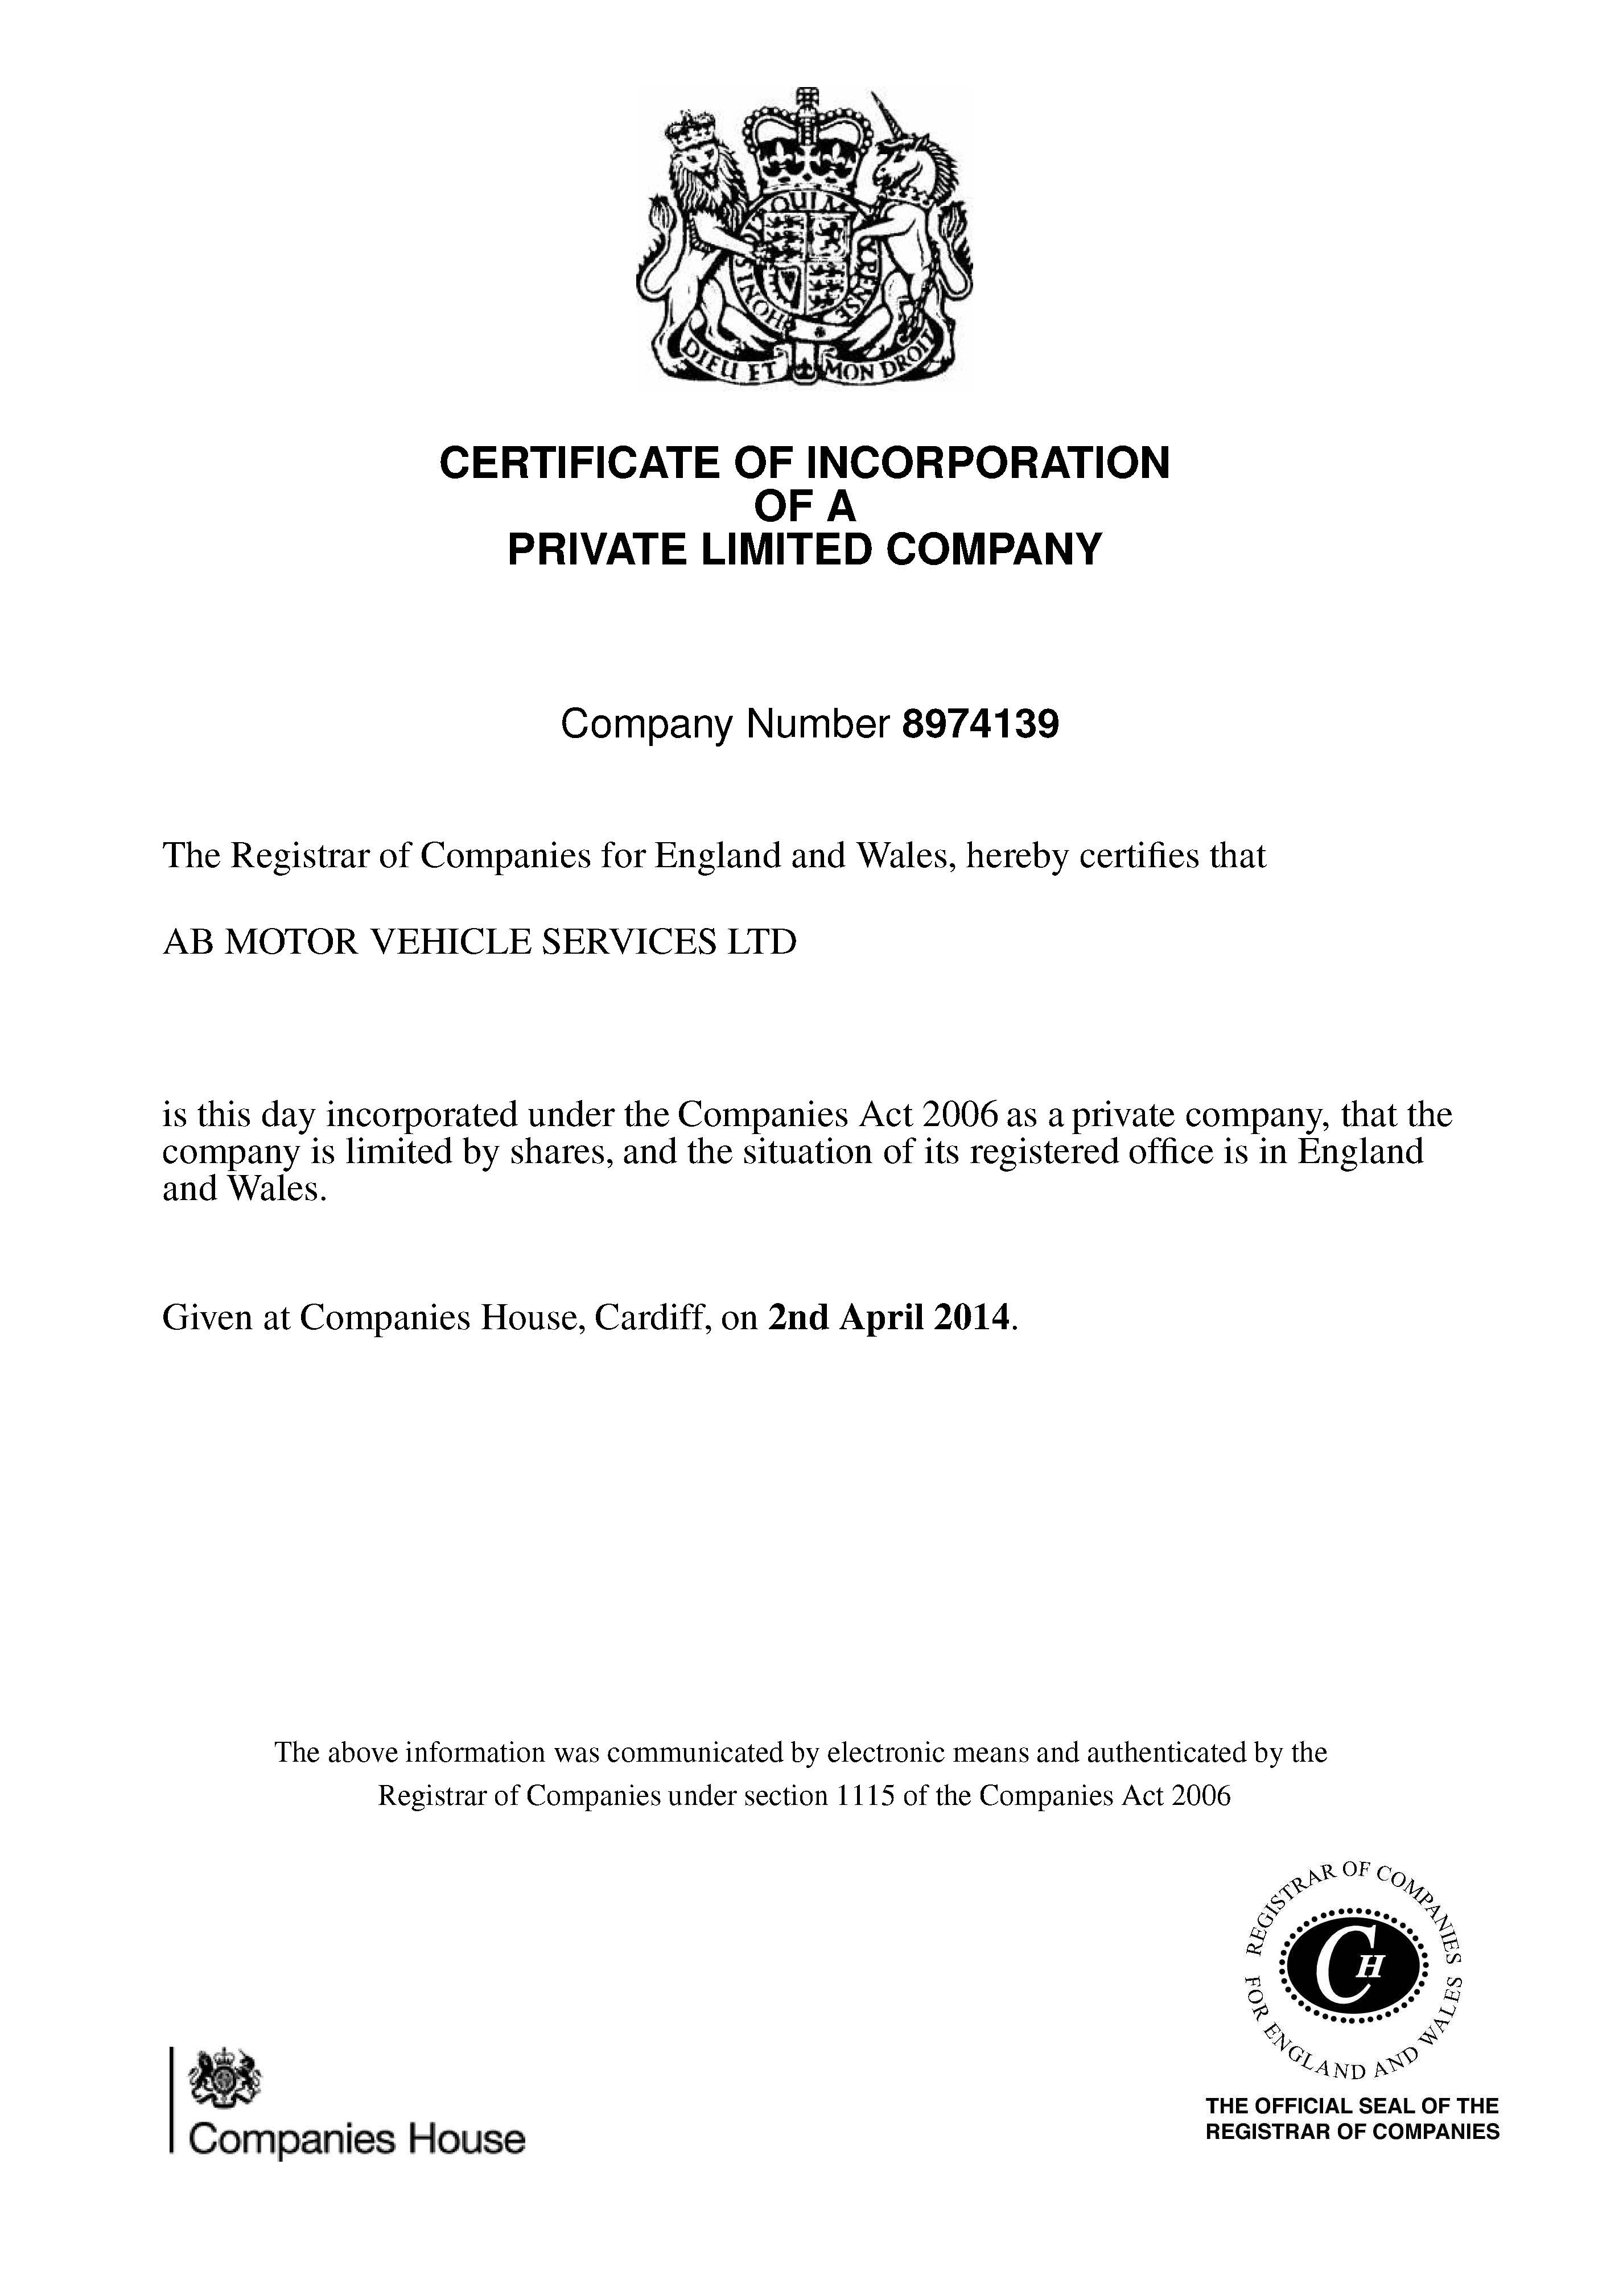 AB Motor Vehicle Services Ltd